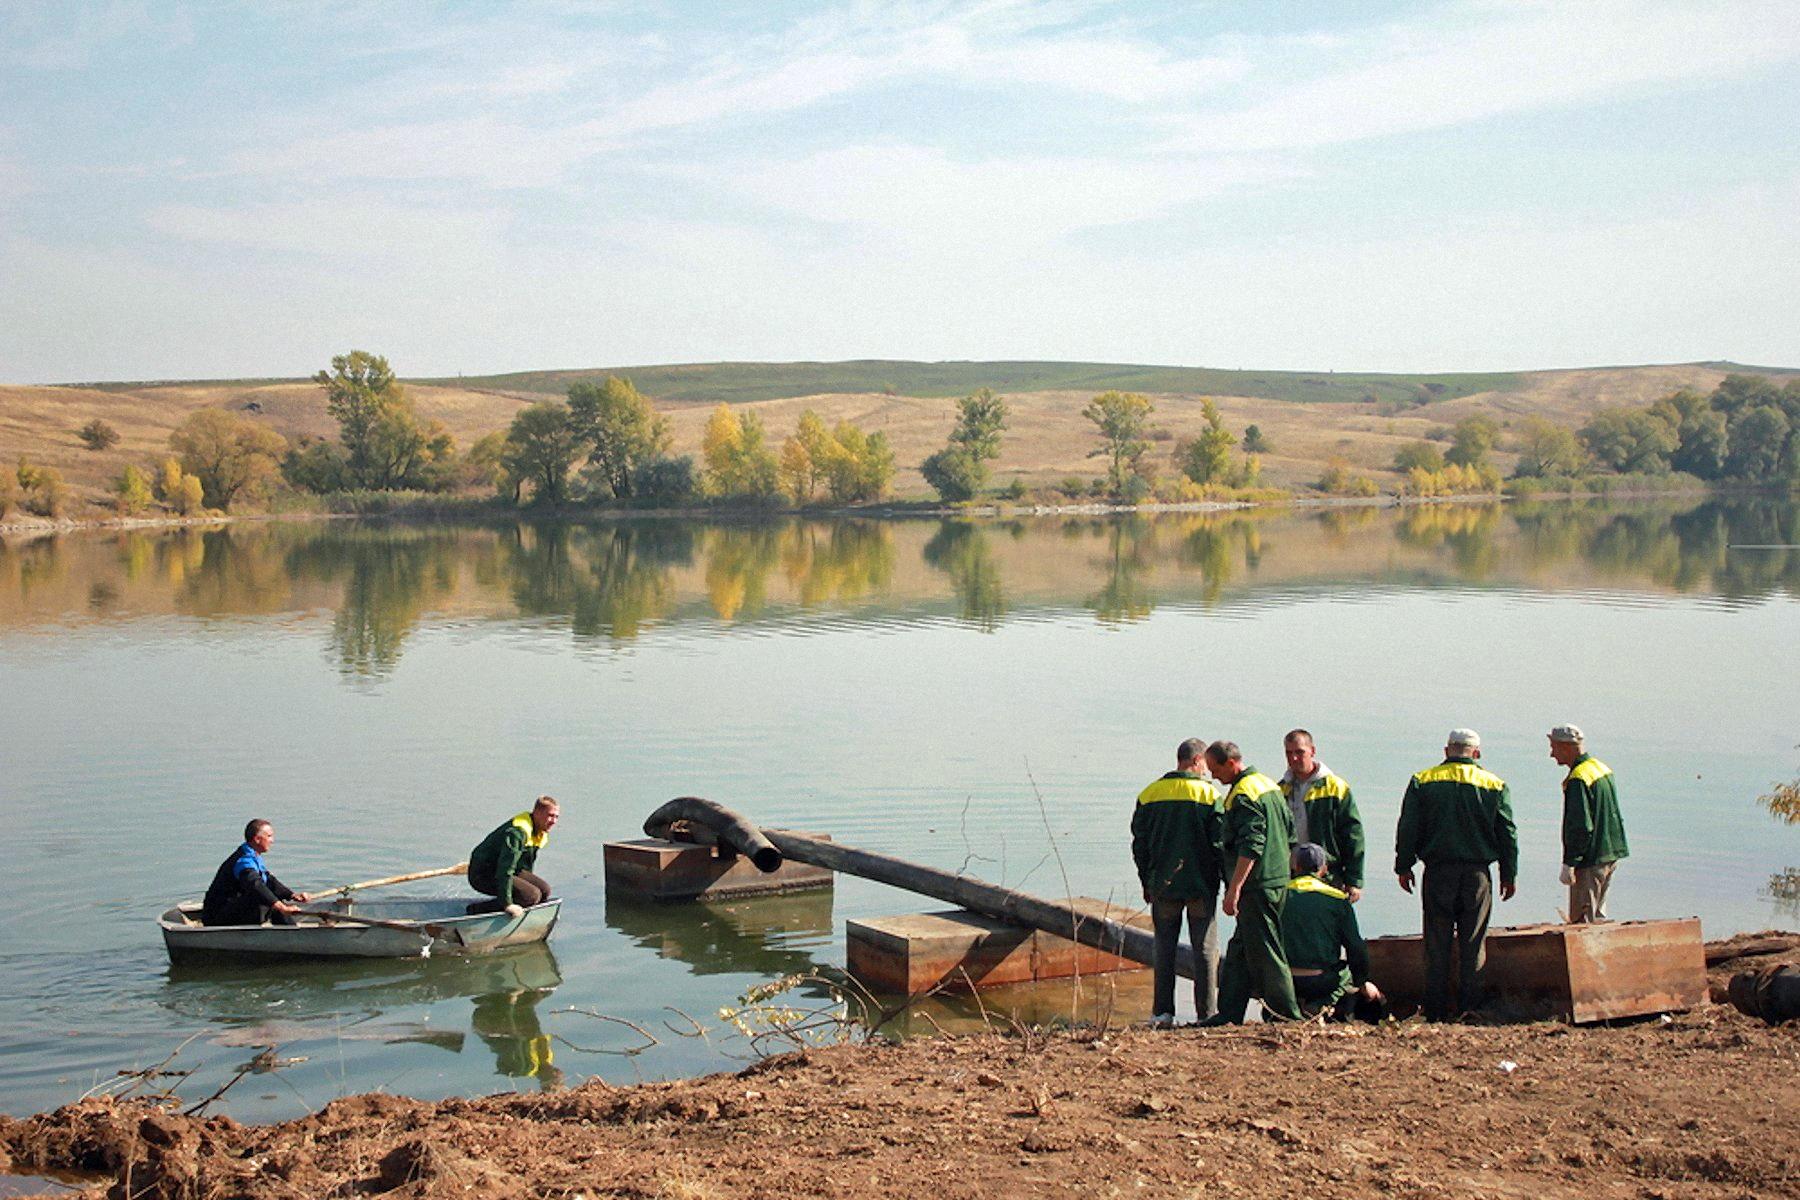 00 lnr reservoir lugansk pr 02 091015